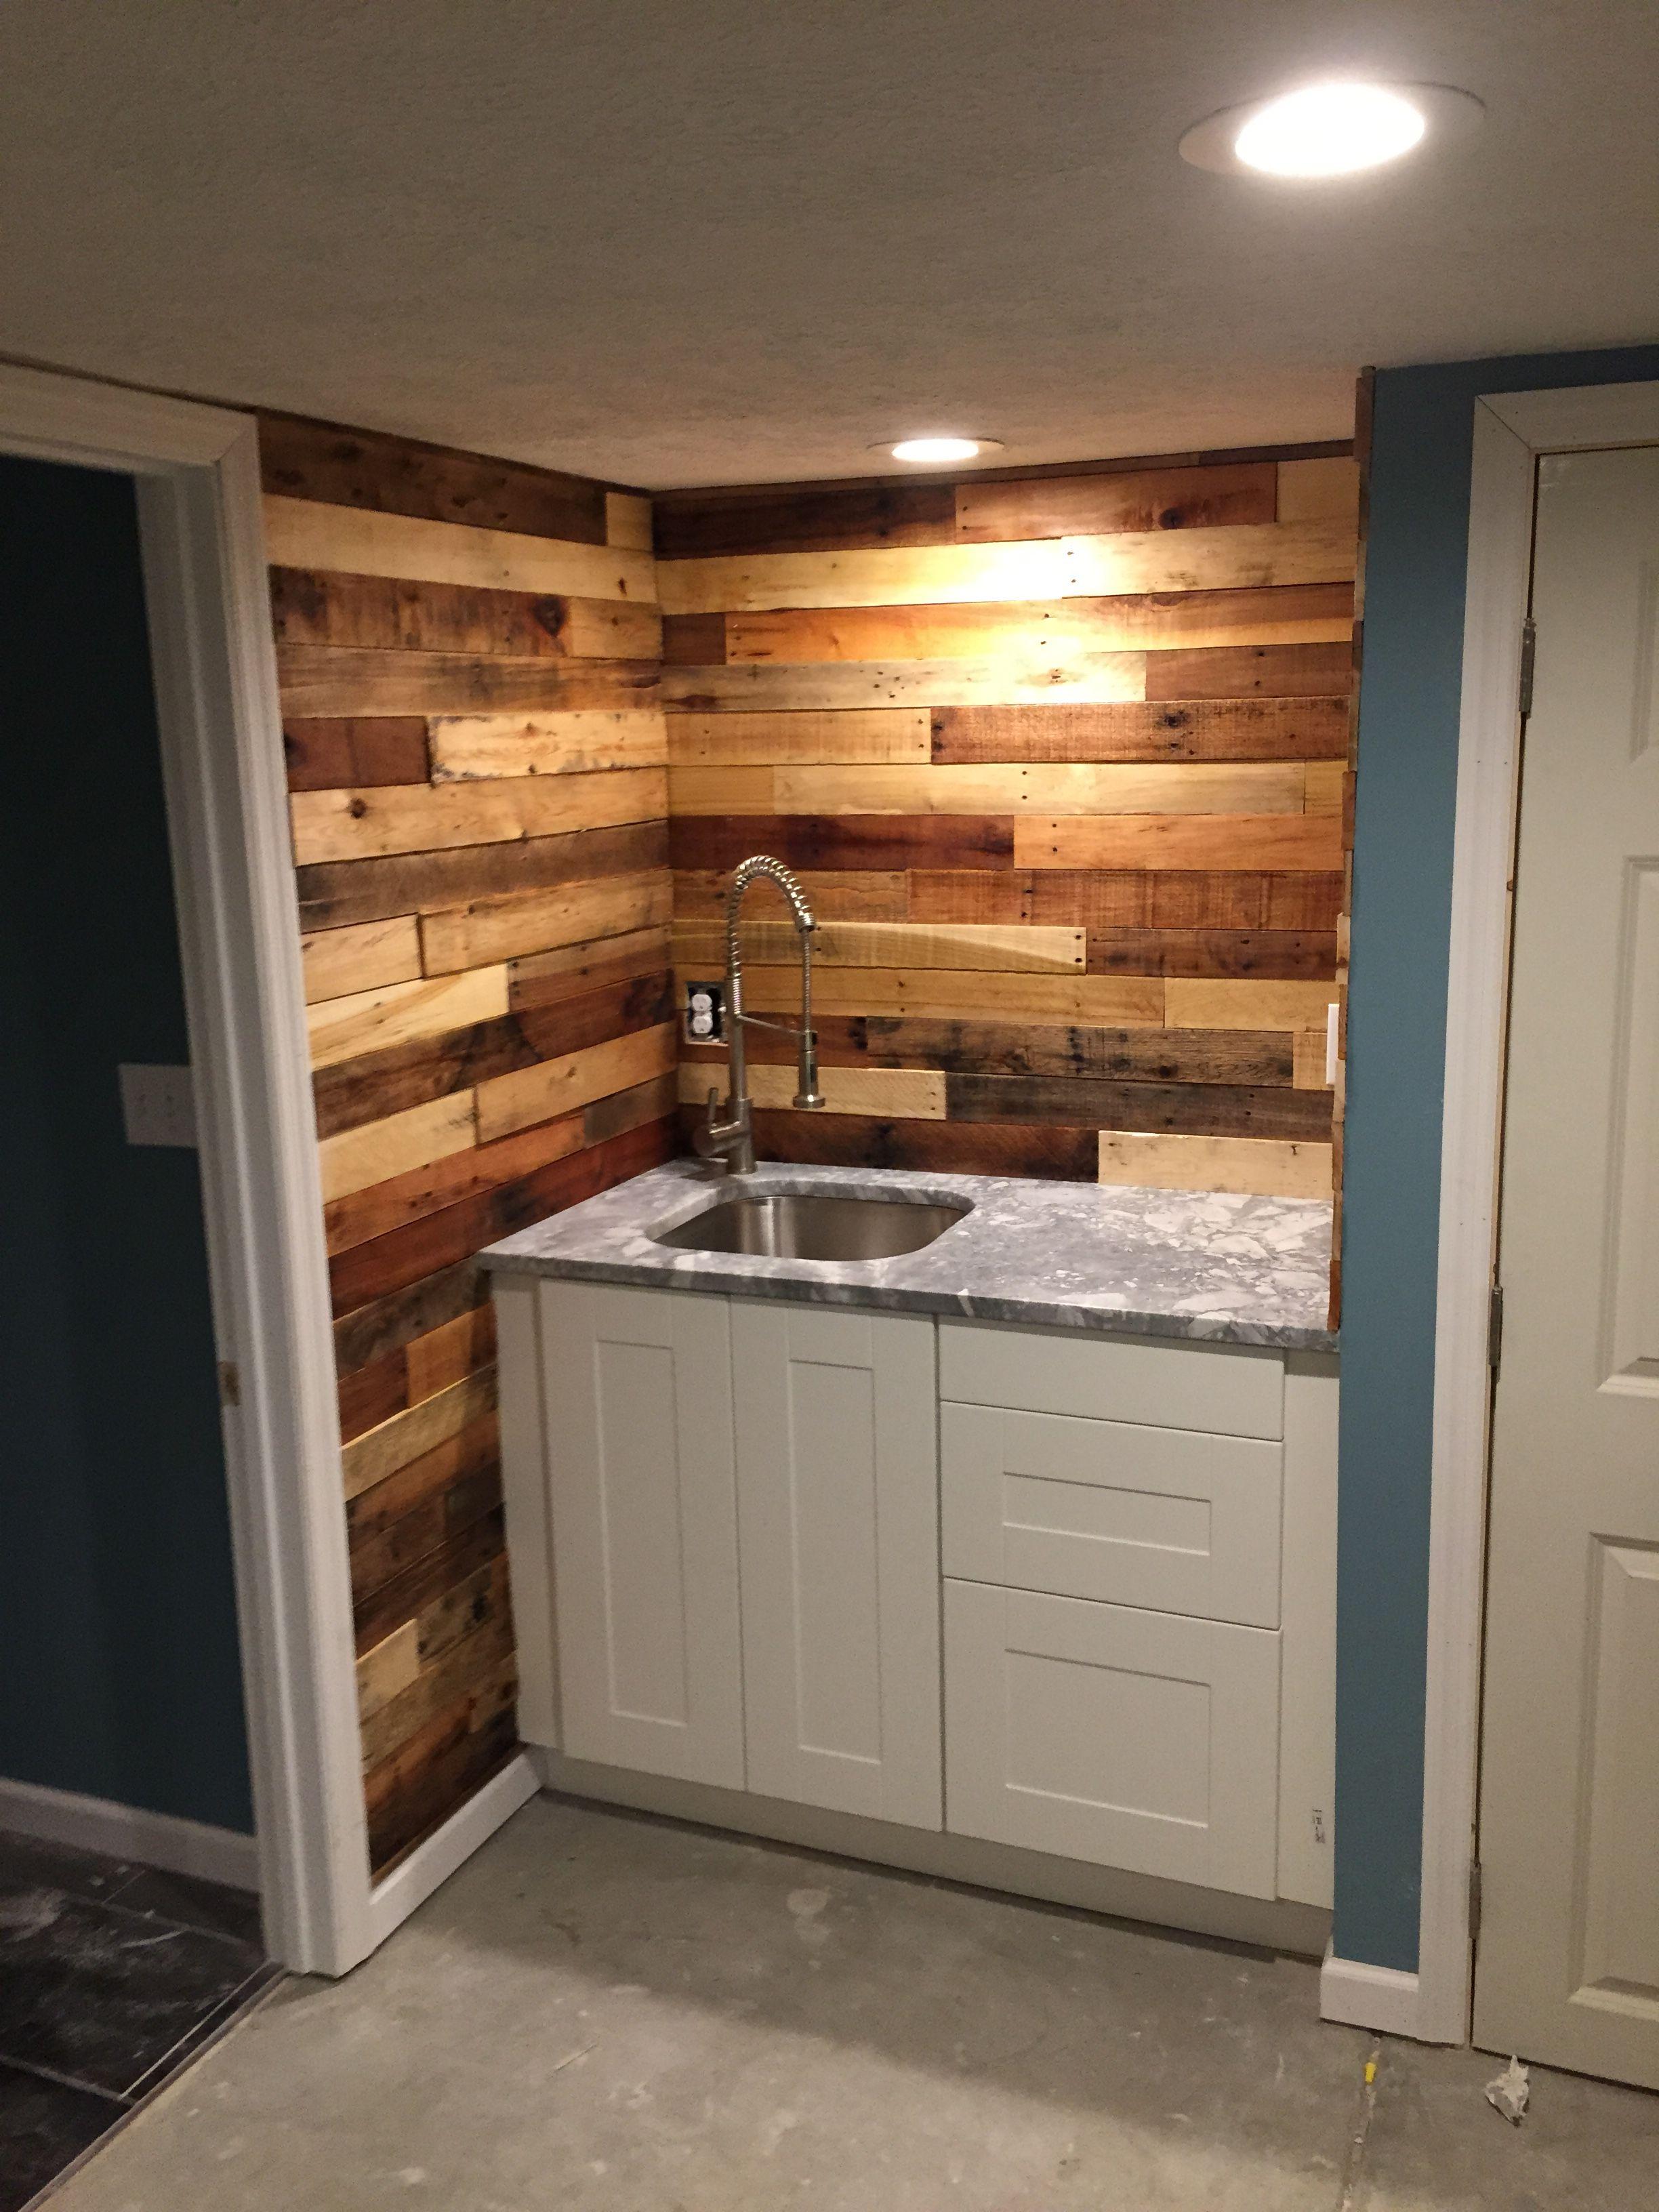 Reclaimed wood back splash | Wood pallet wall, Pallet ...